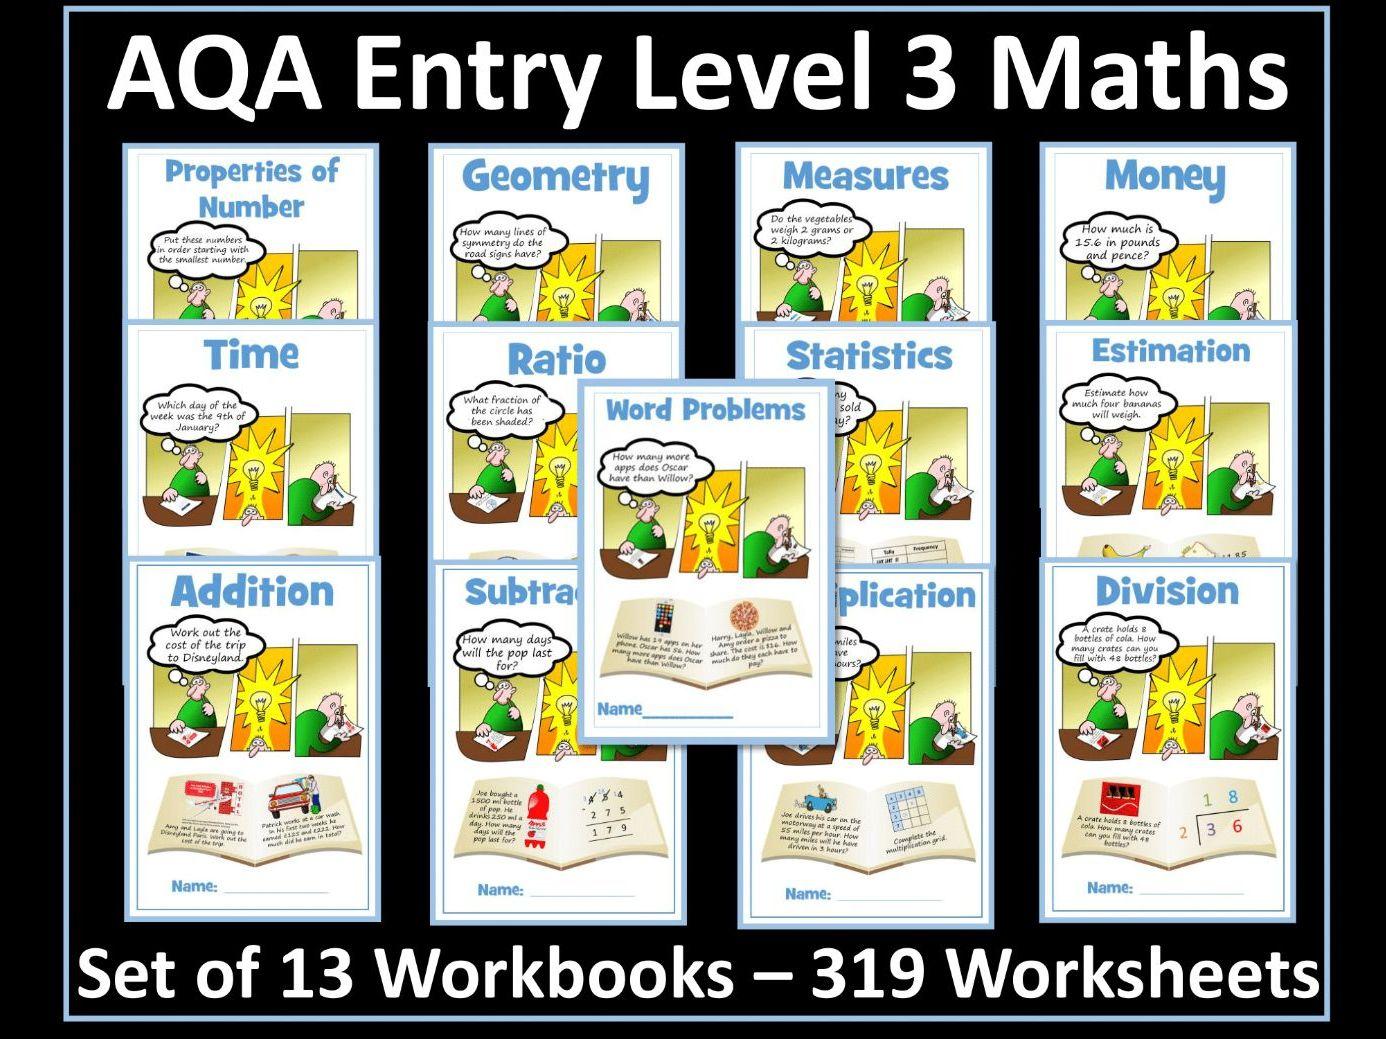 Aqa Entry Level 3 Maths Bundle